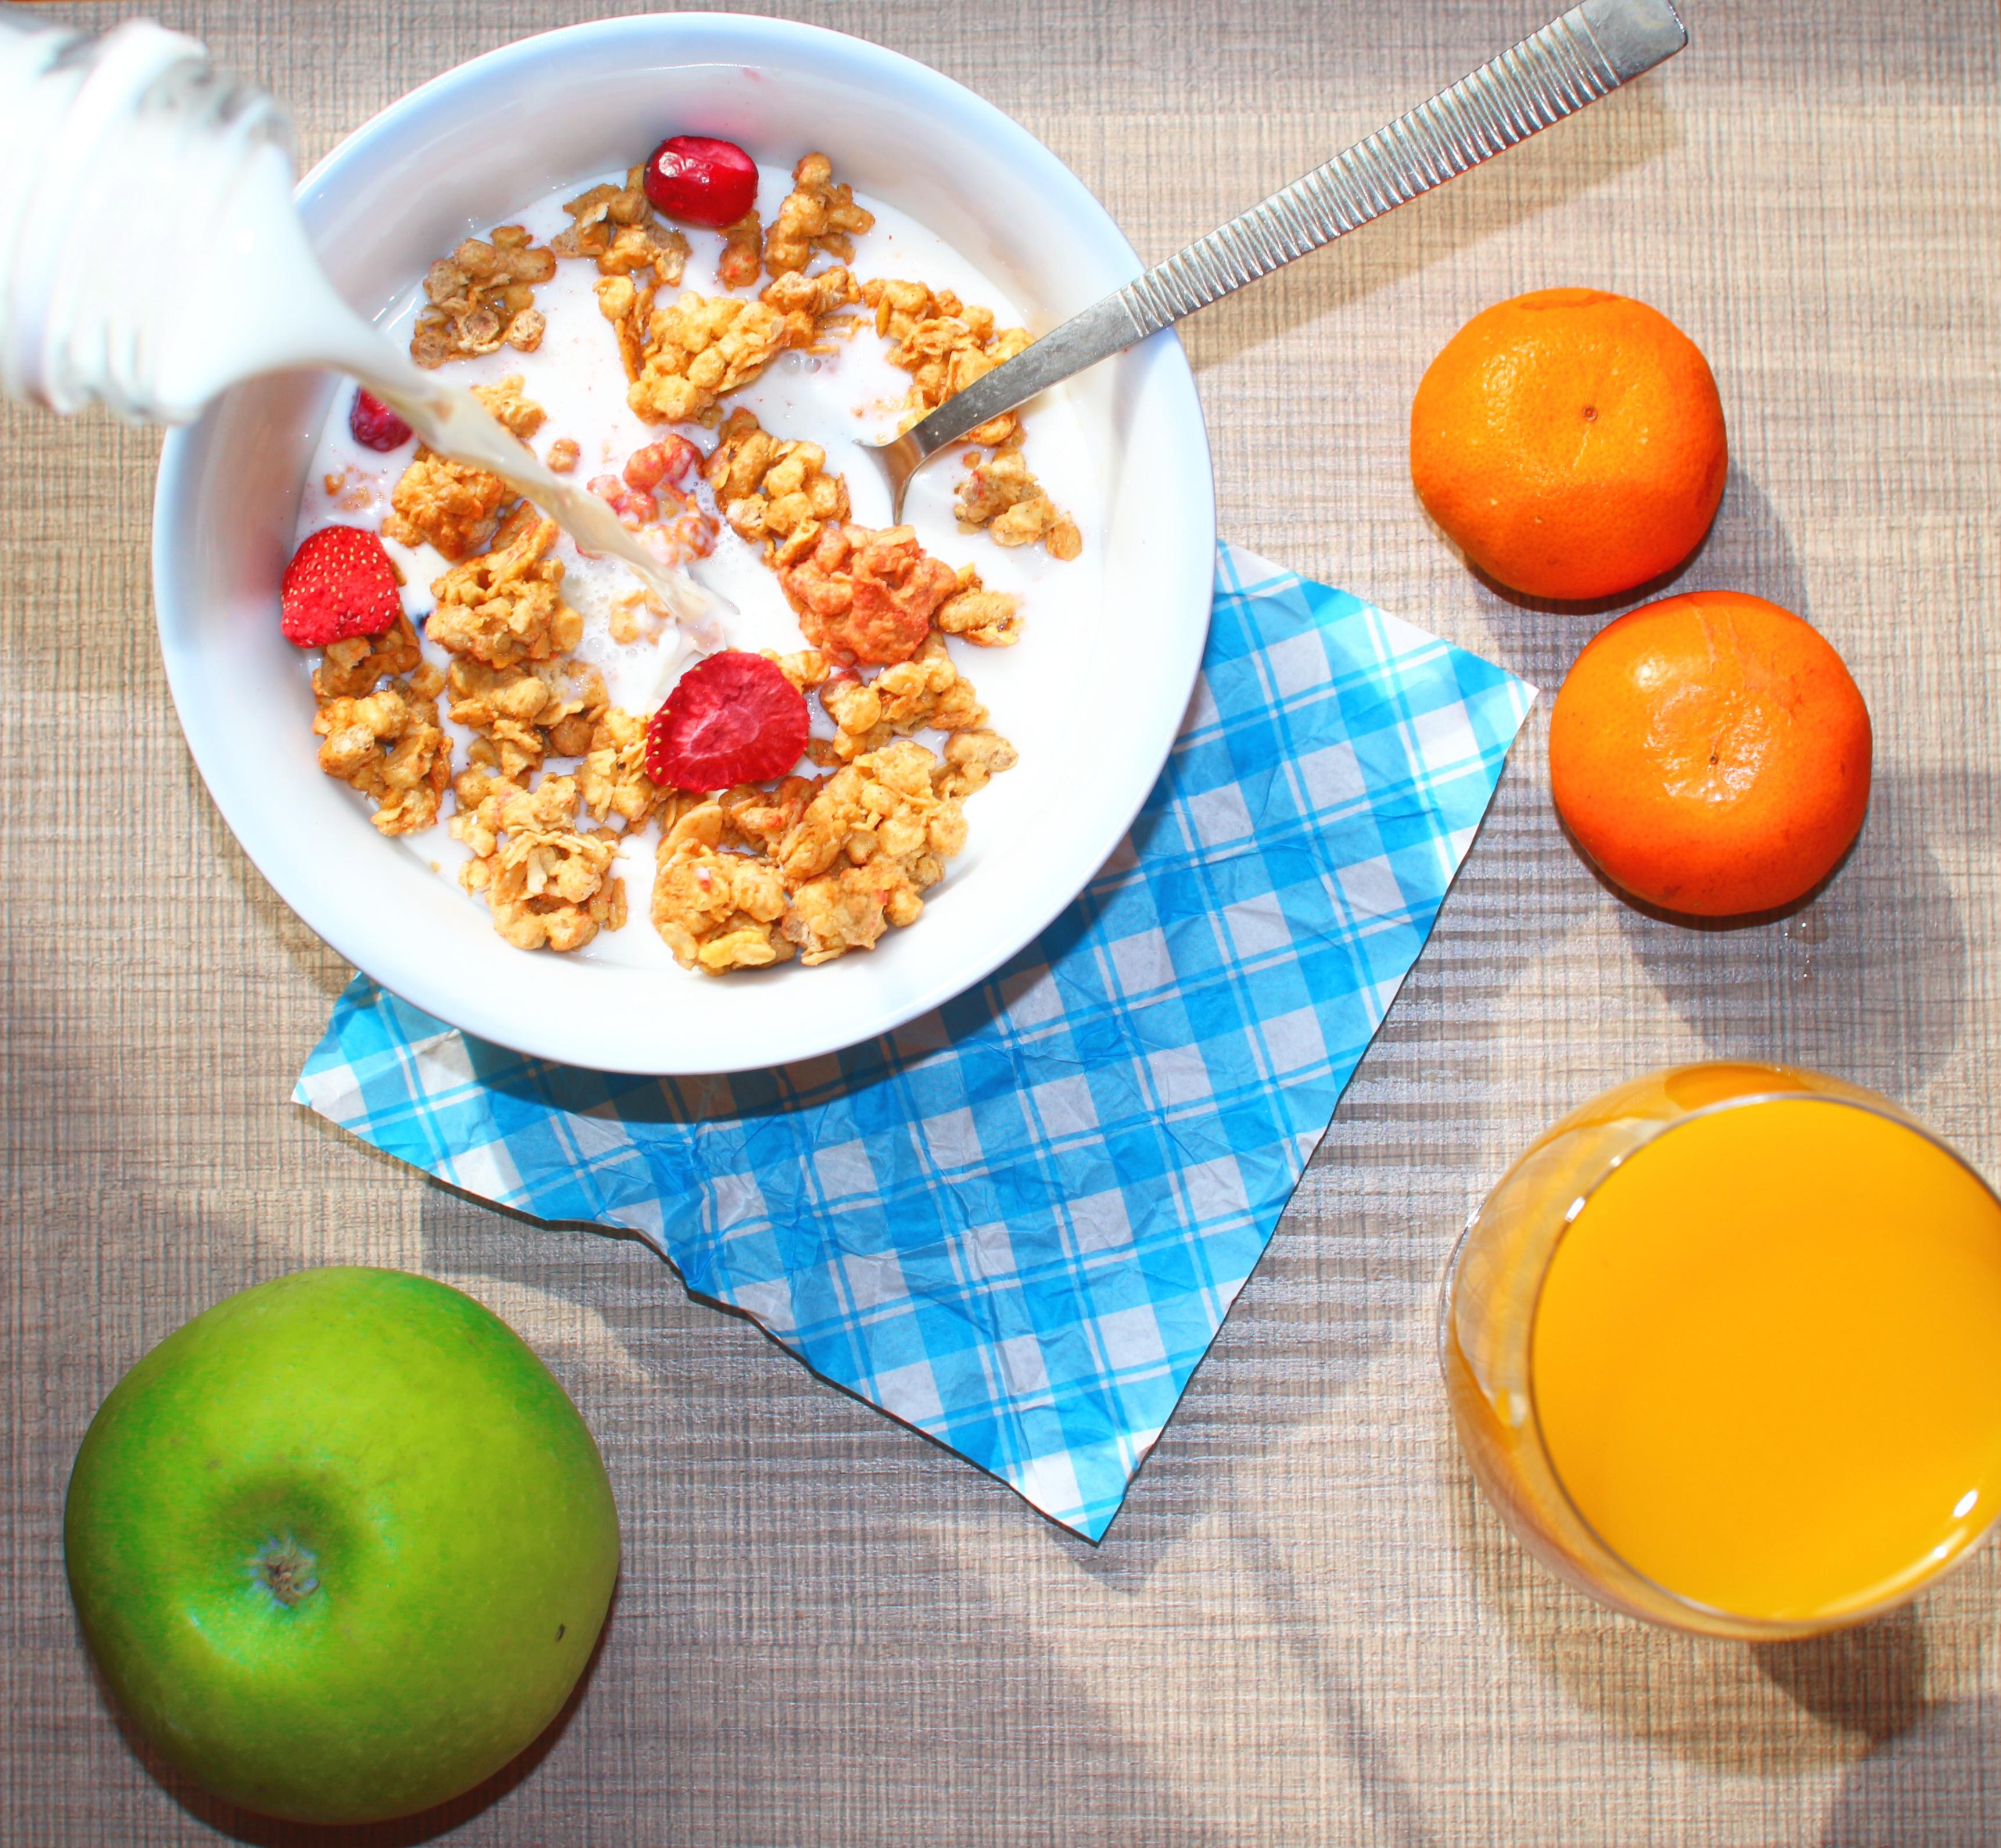 Fotos Gratis : Fruta, Naranja, Plato, Produce, Leche